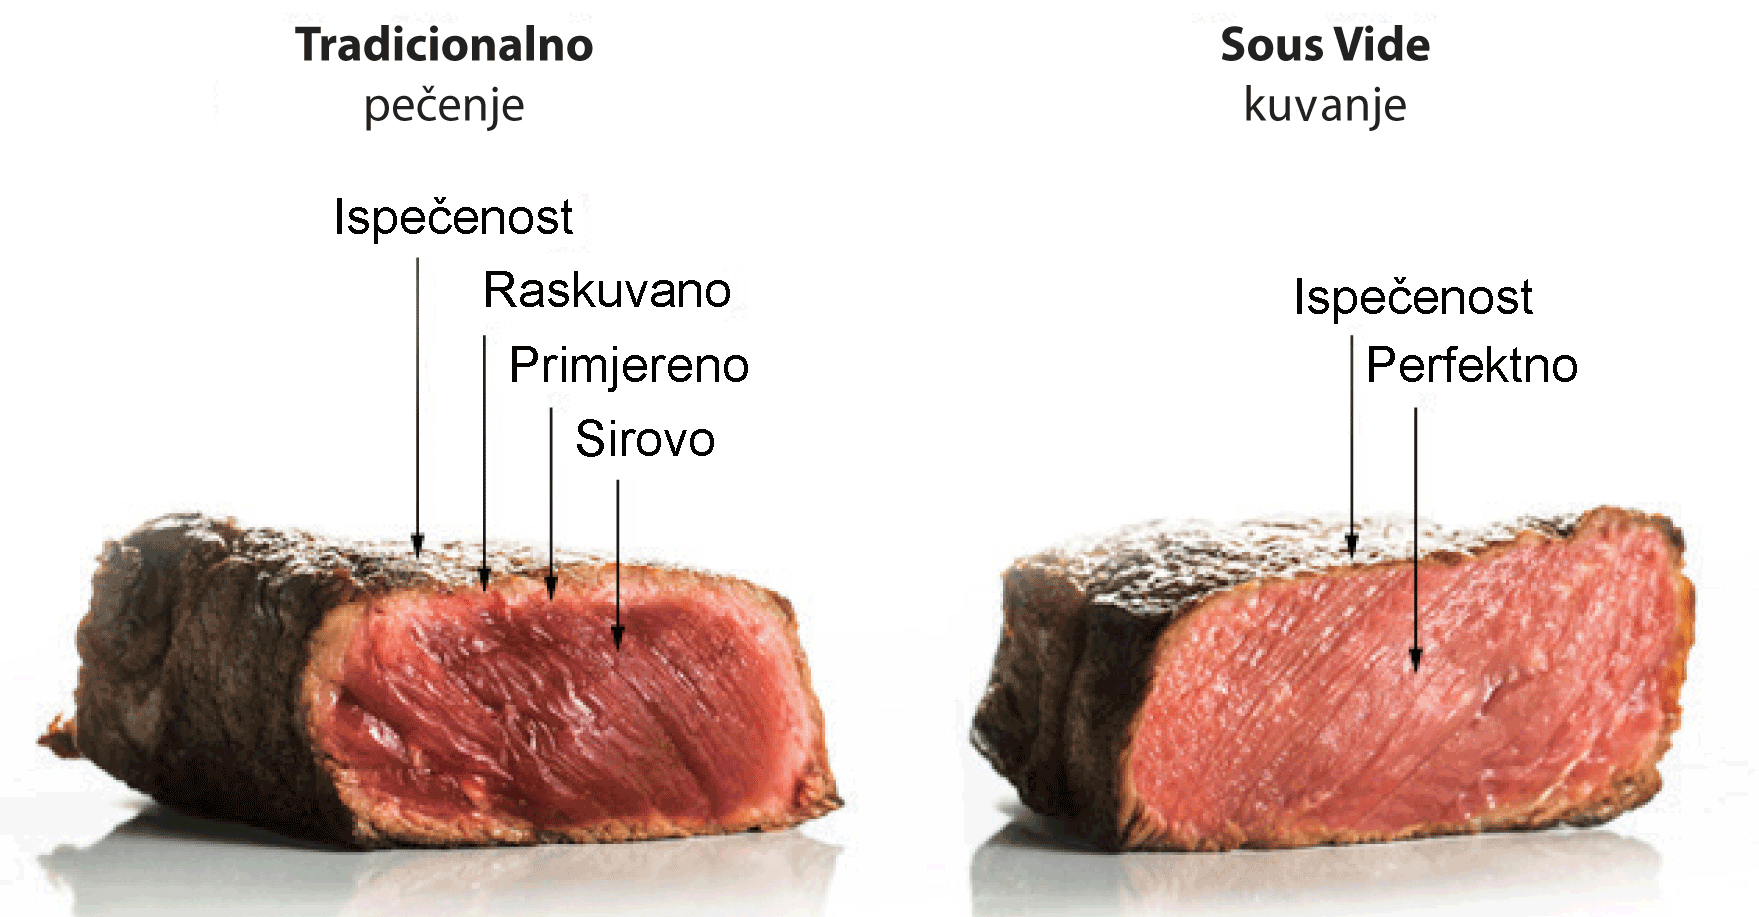 Sous-vide-stek